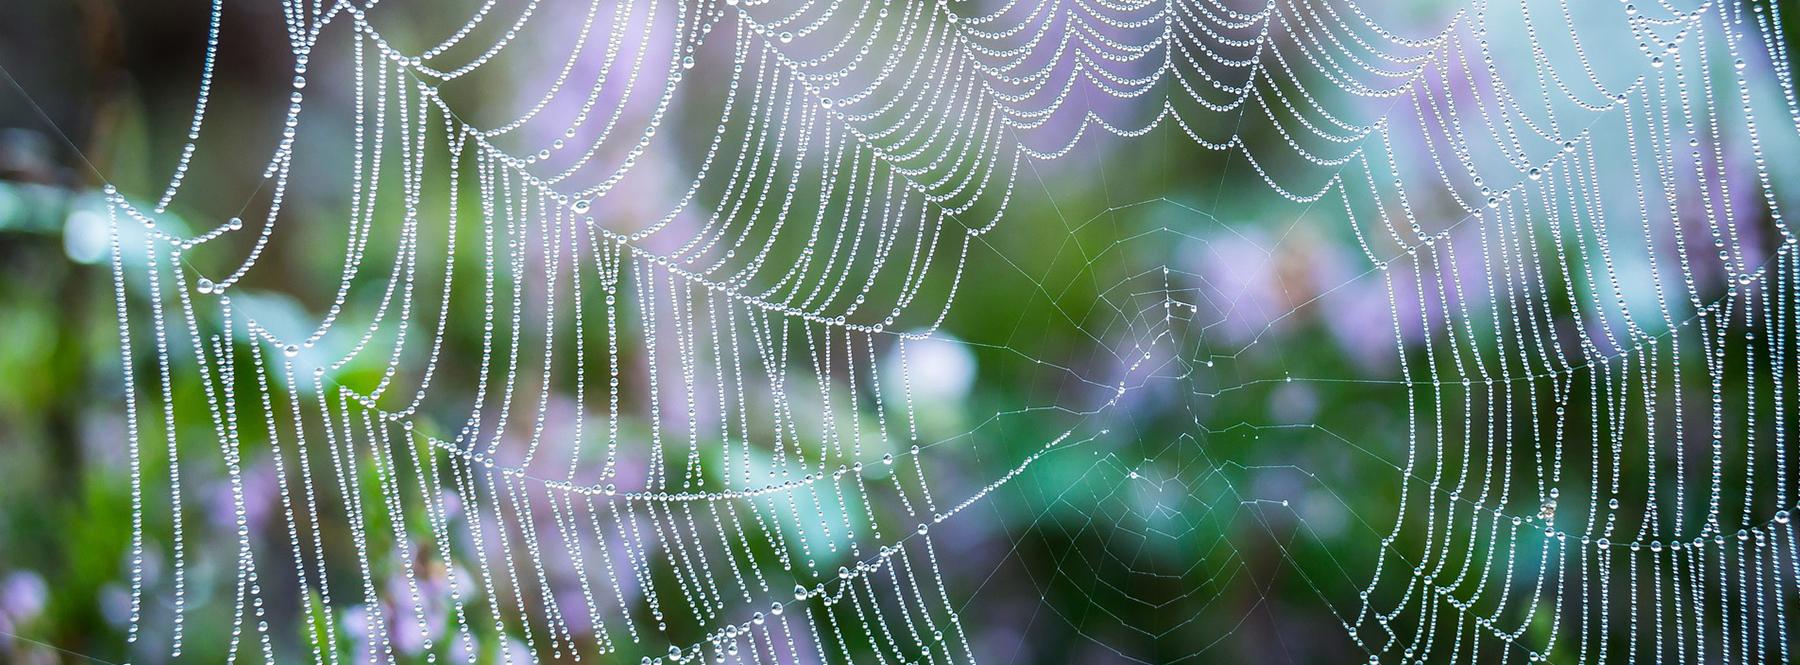 ¿Músculos artificiales para robots elaborados con tela de araña?